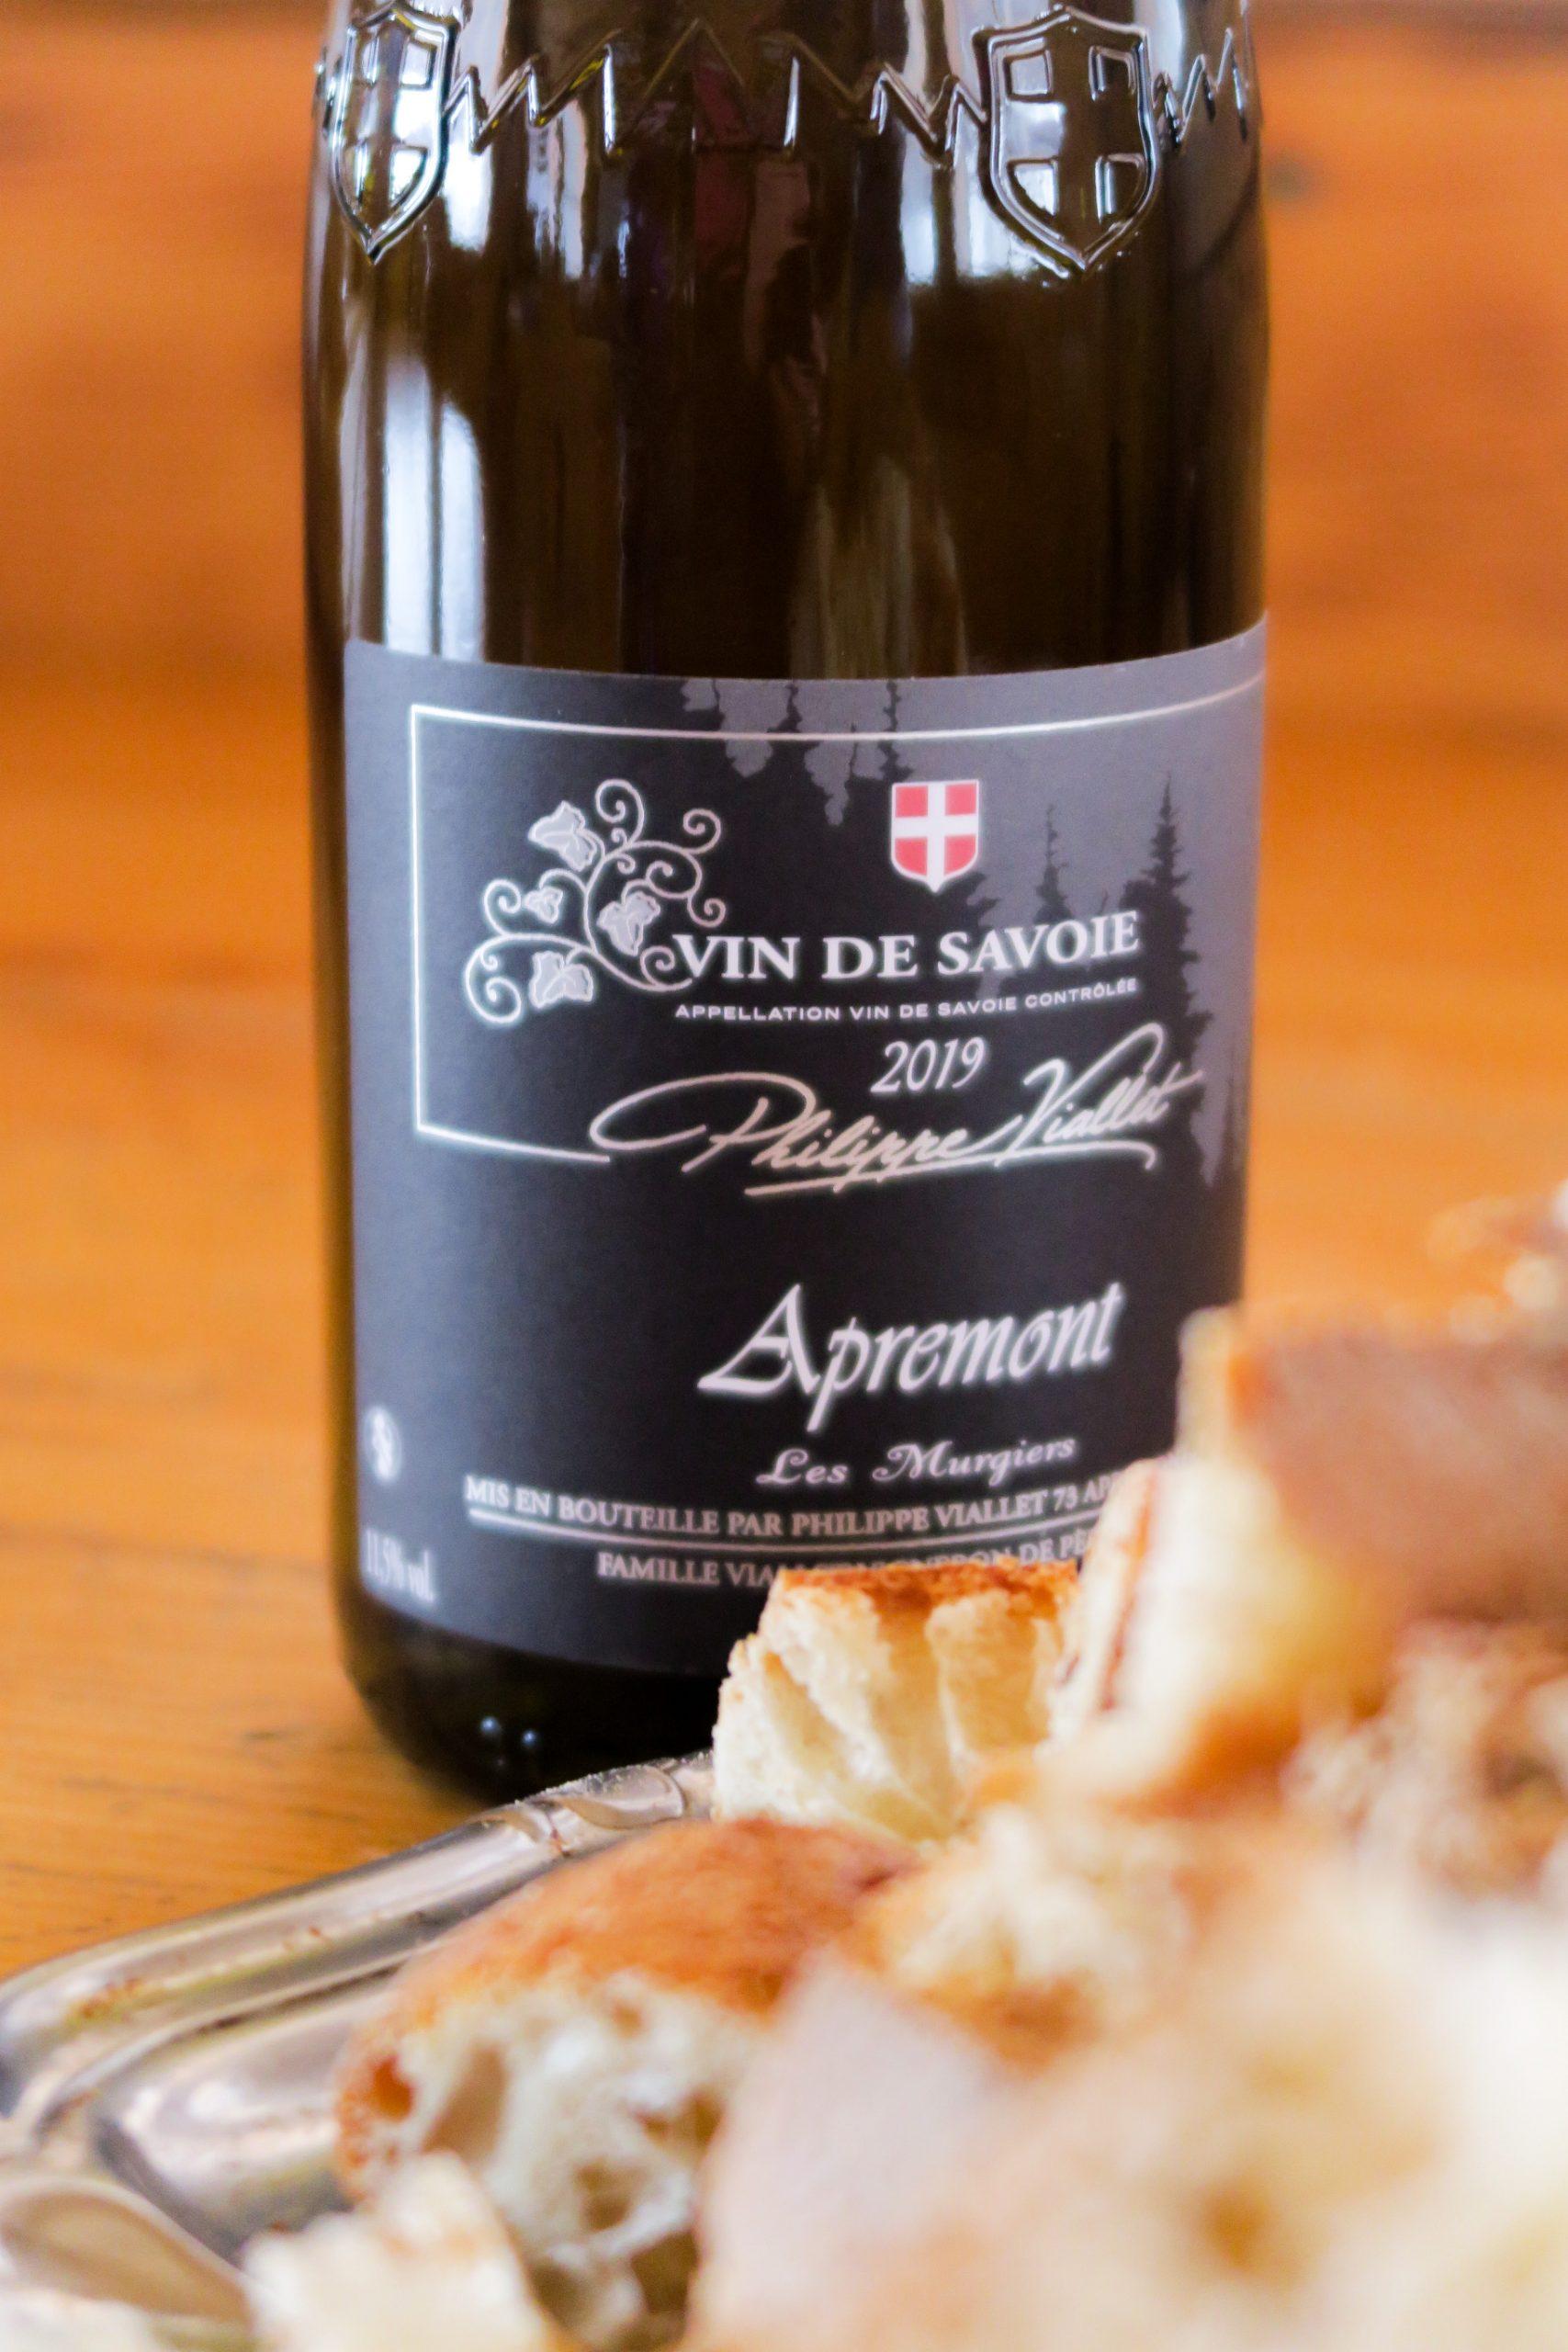 vin de savoie pays albertville